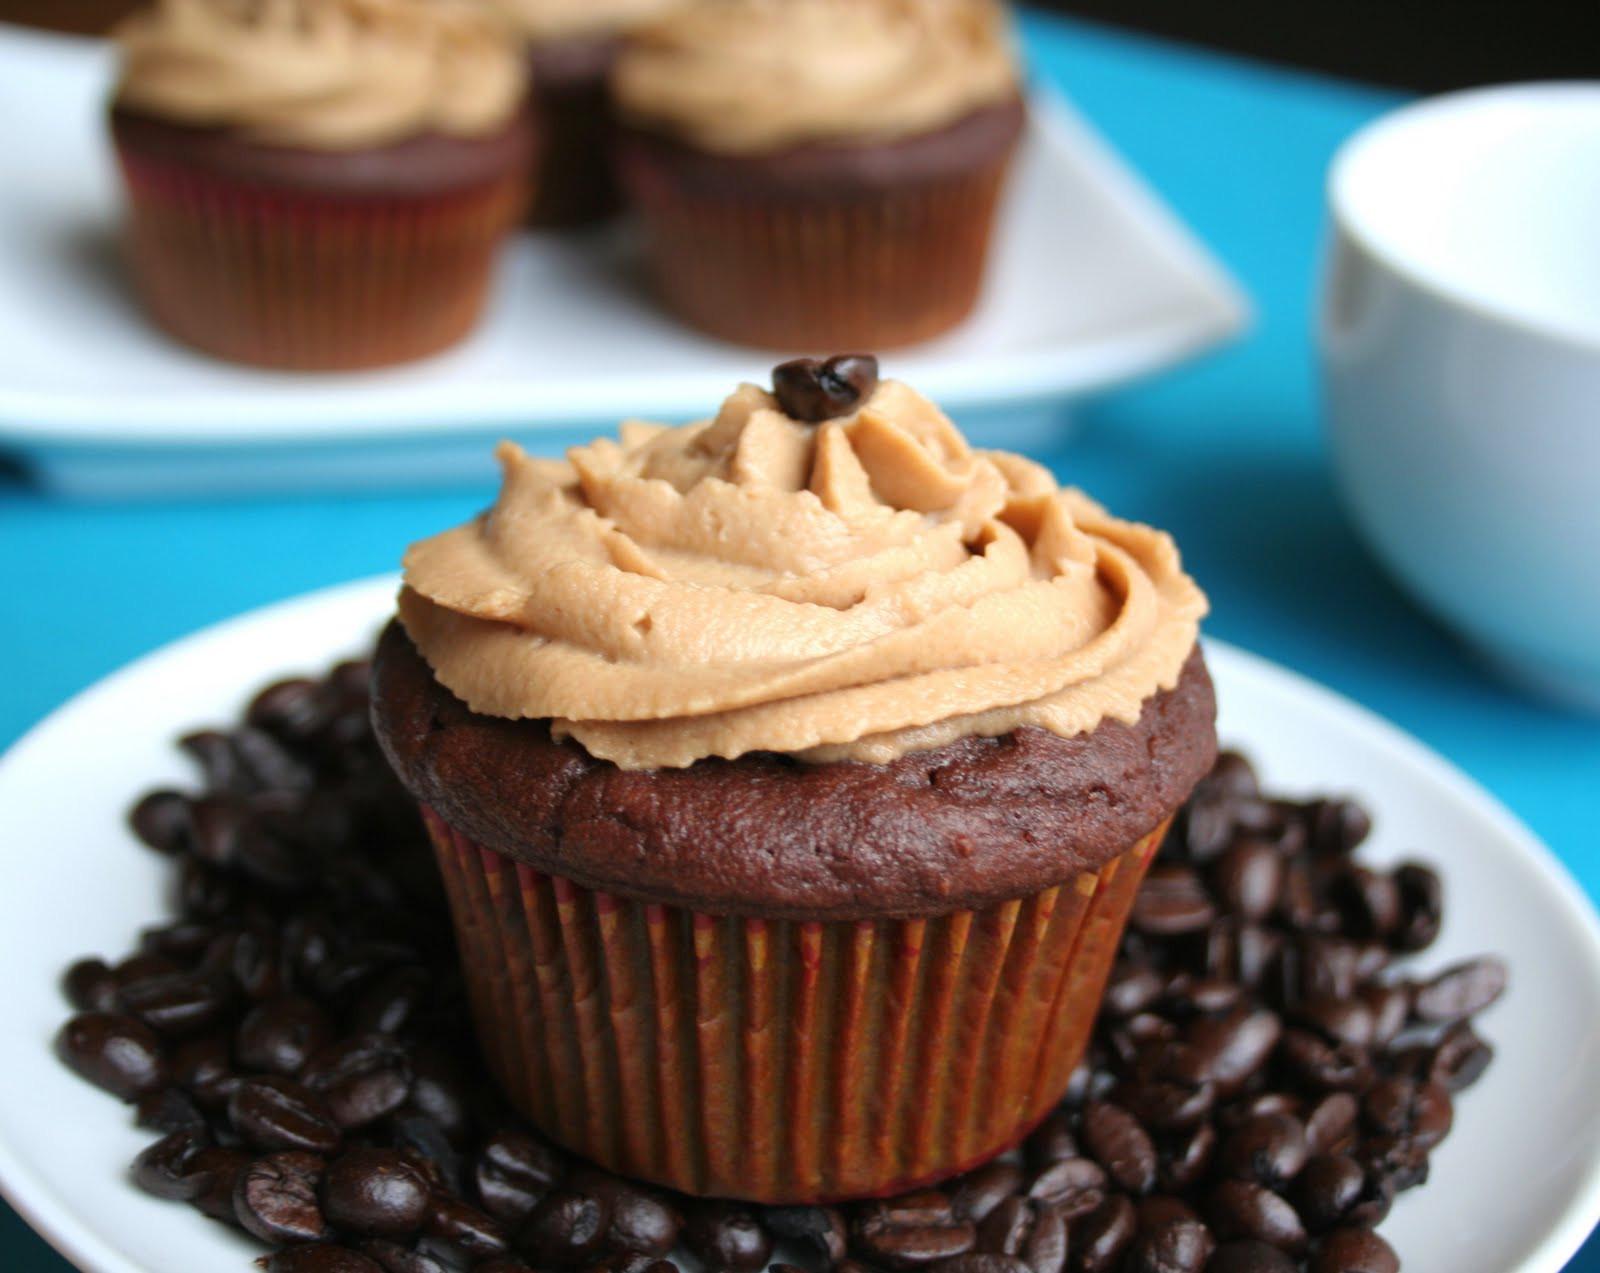 Coconut Flour Cupcakes  Low Carb Chocolate Coconut Flour Cupcakes